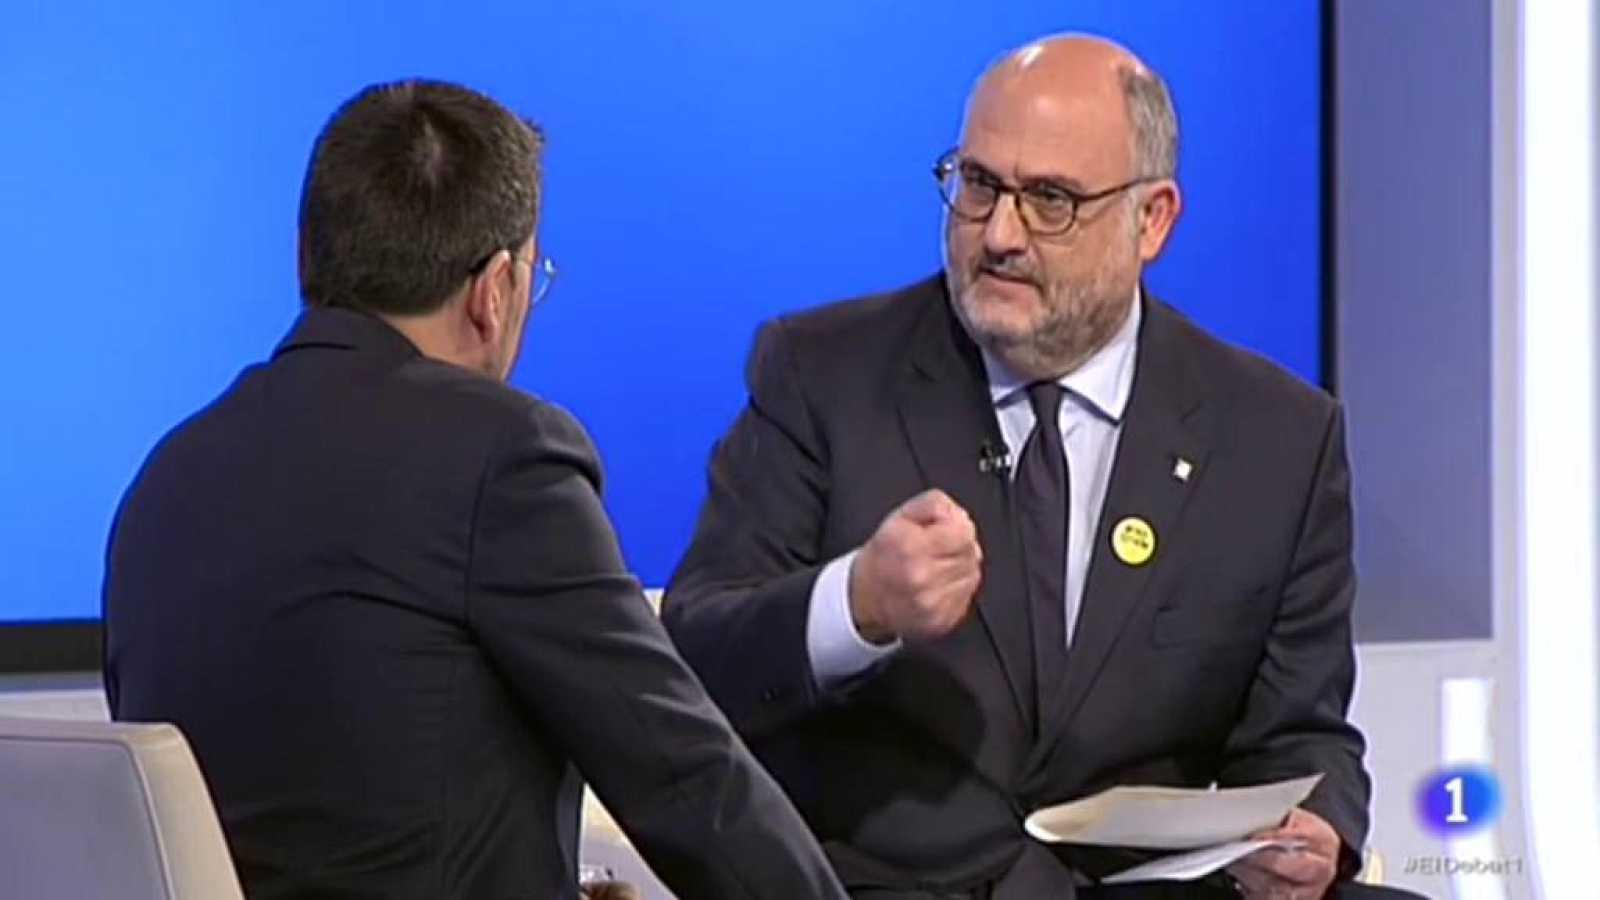 El Debat de La 1 - Entrevista a Eduard Pujol